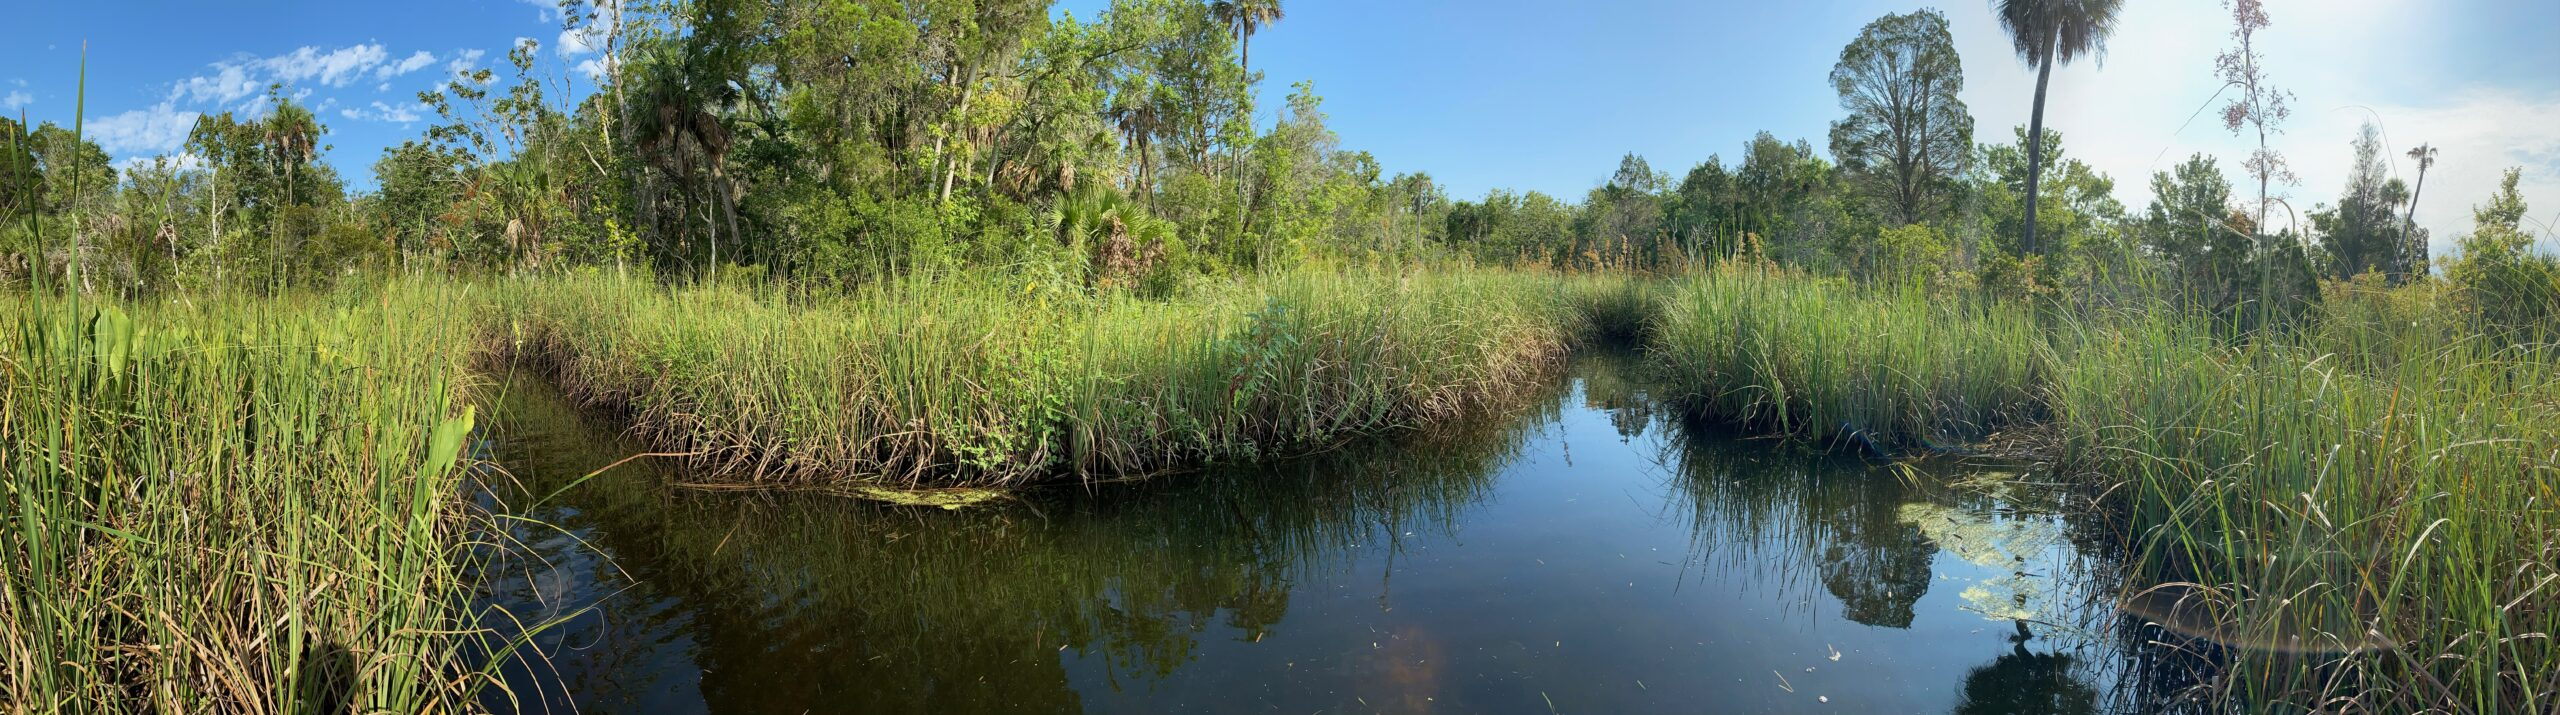 Sawgrasses and Salinity